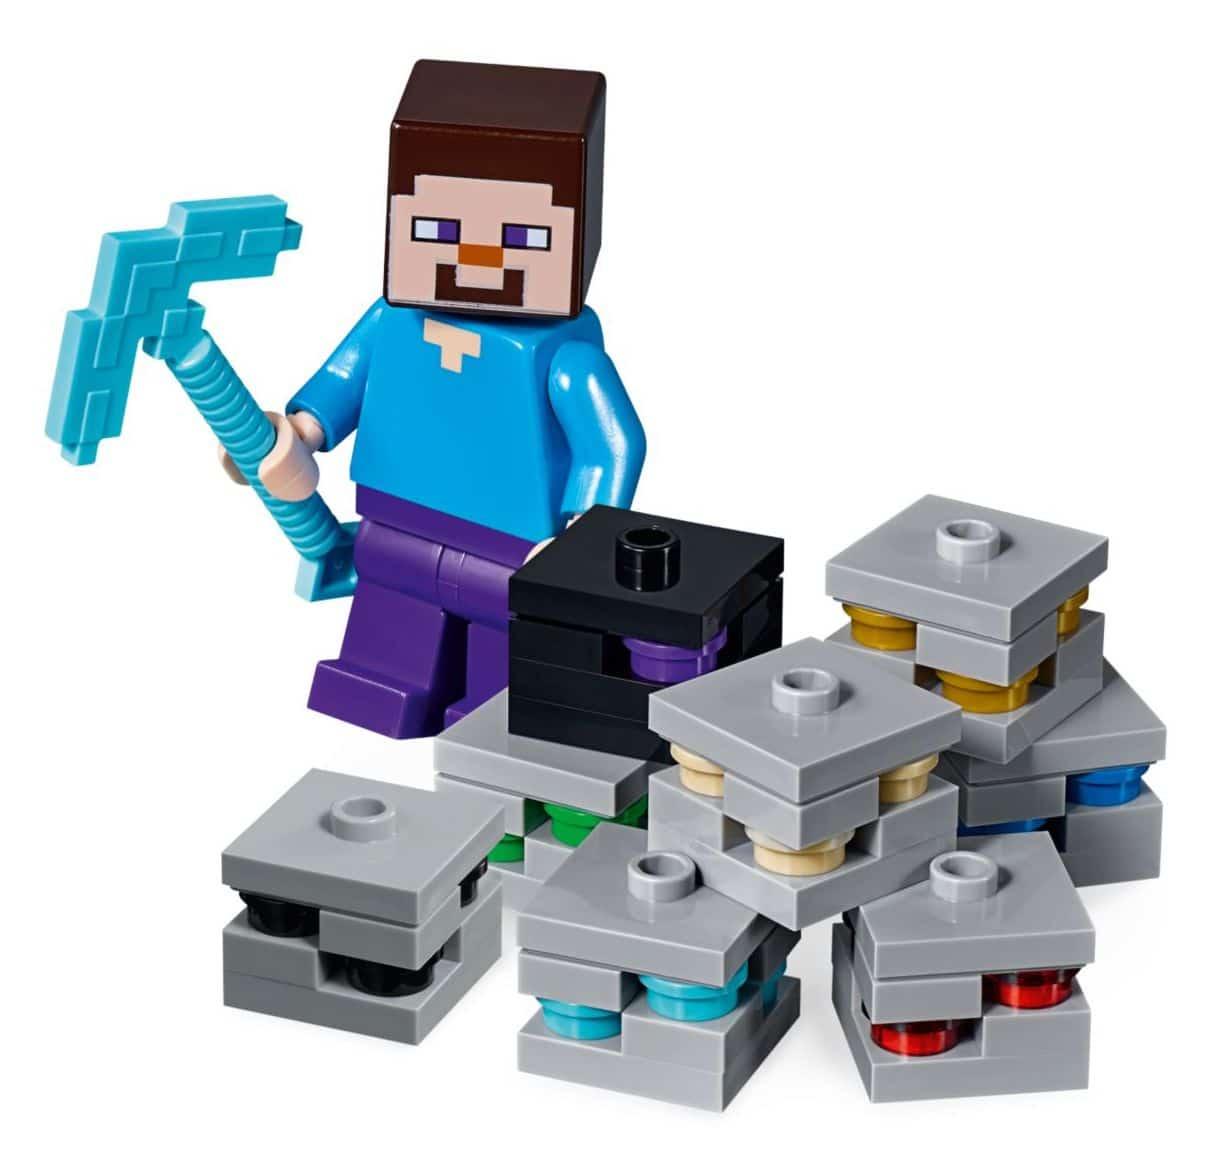 LEGO Minecraft 21147 The Bedrock Adventure